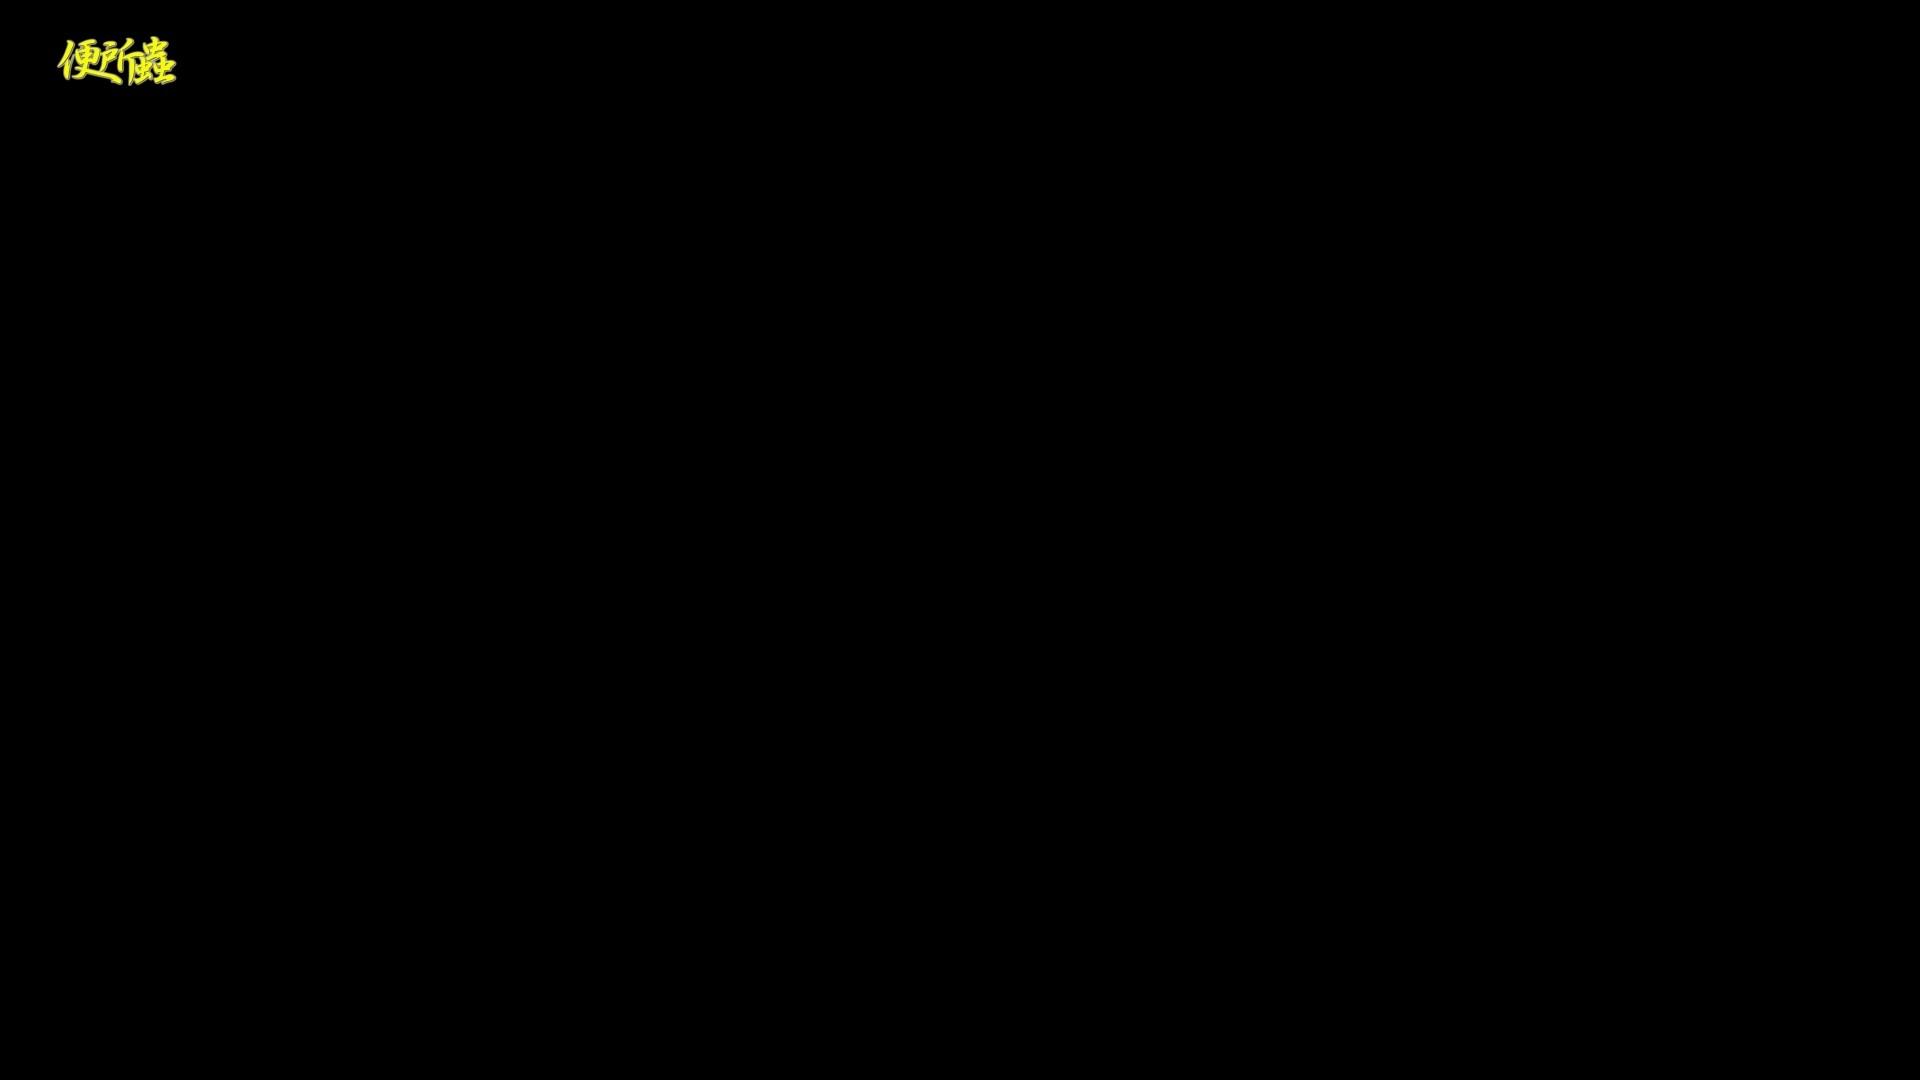 vol.09 便所蟲さんのリターン~寺子屋洗面所盗撮~ 盛合せ 性交動画流出 80枚 66